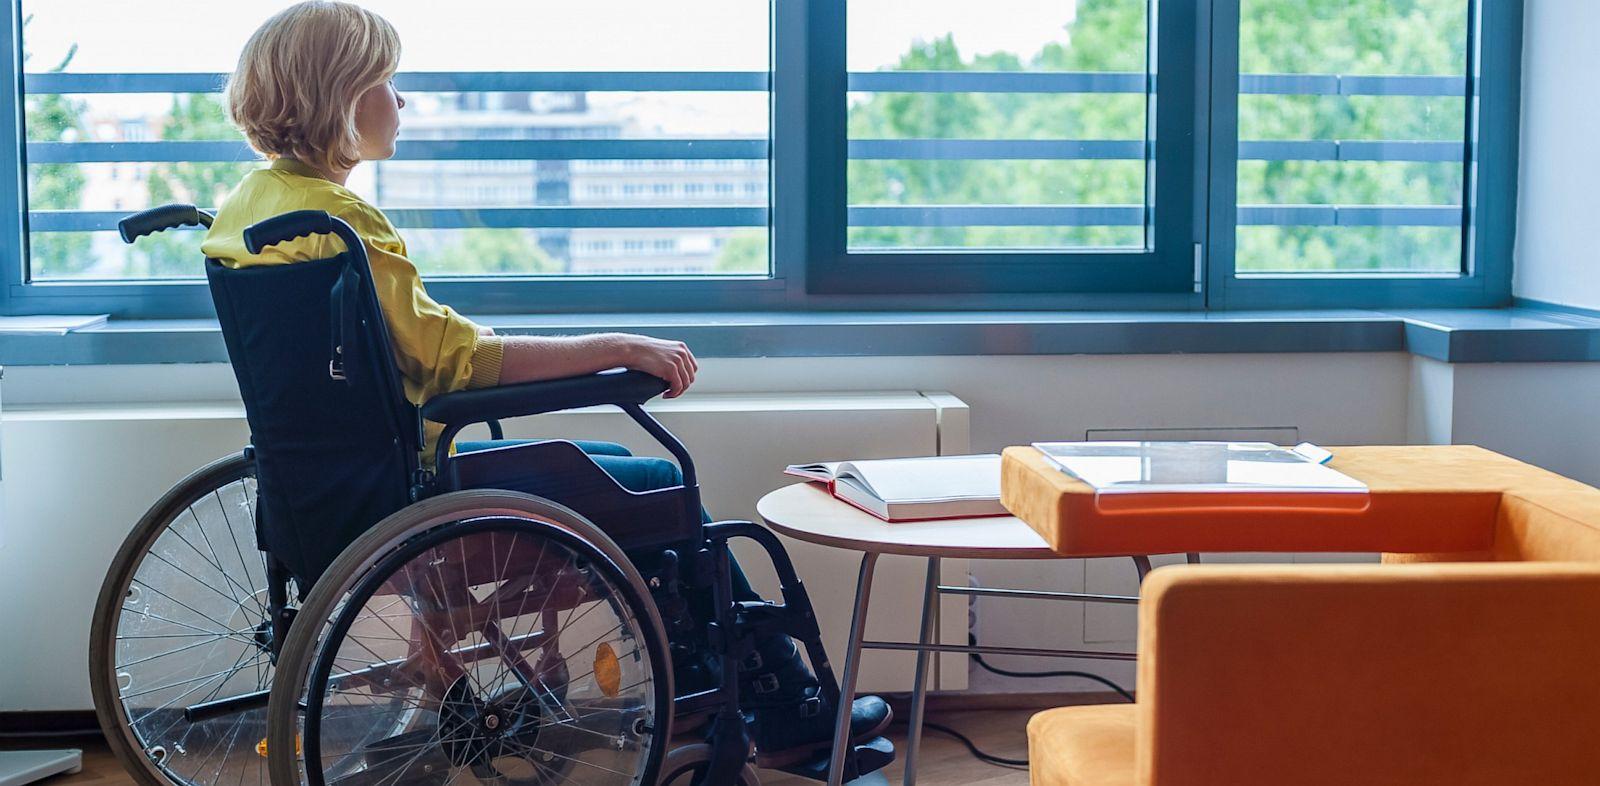 PHOTO: Teen in wheelchair